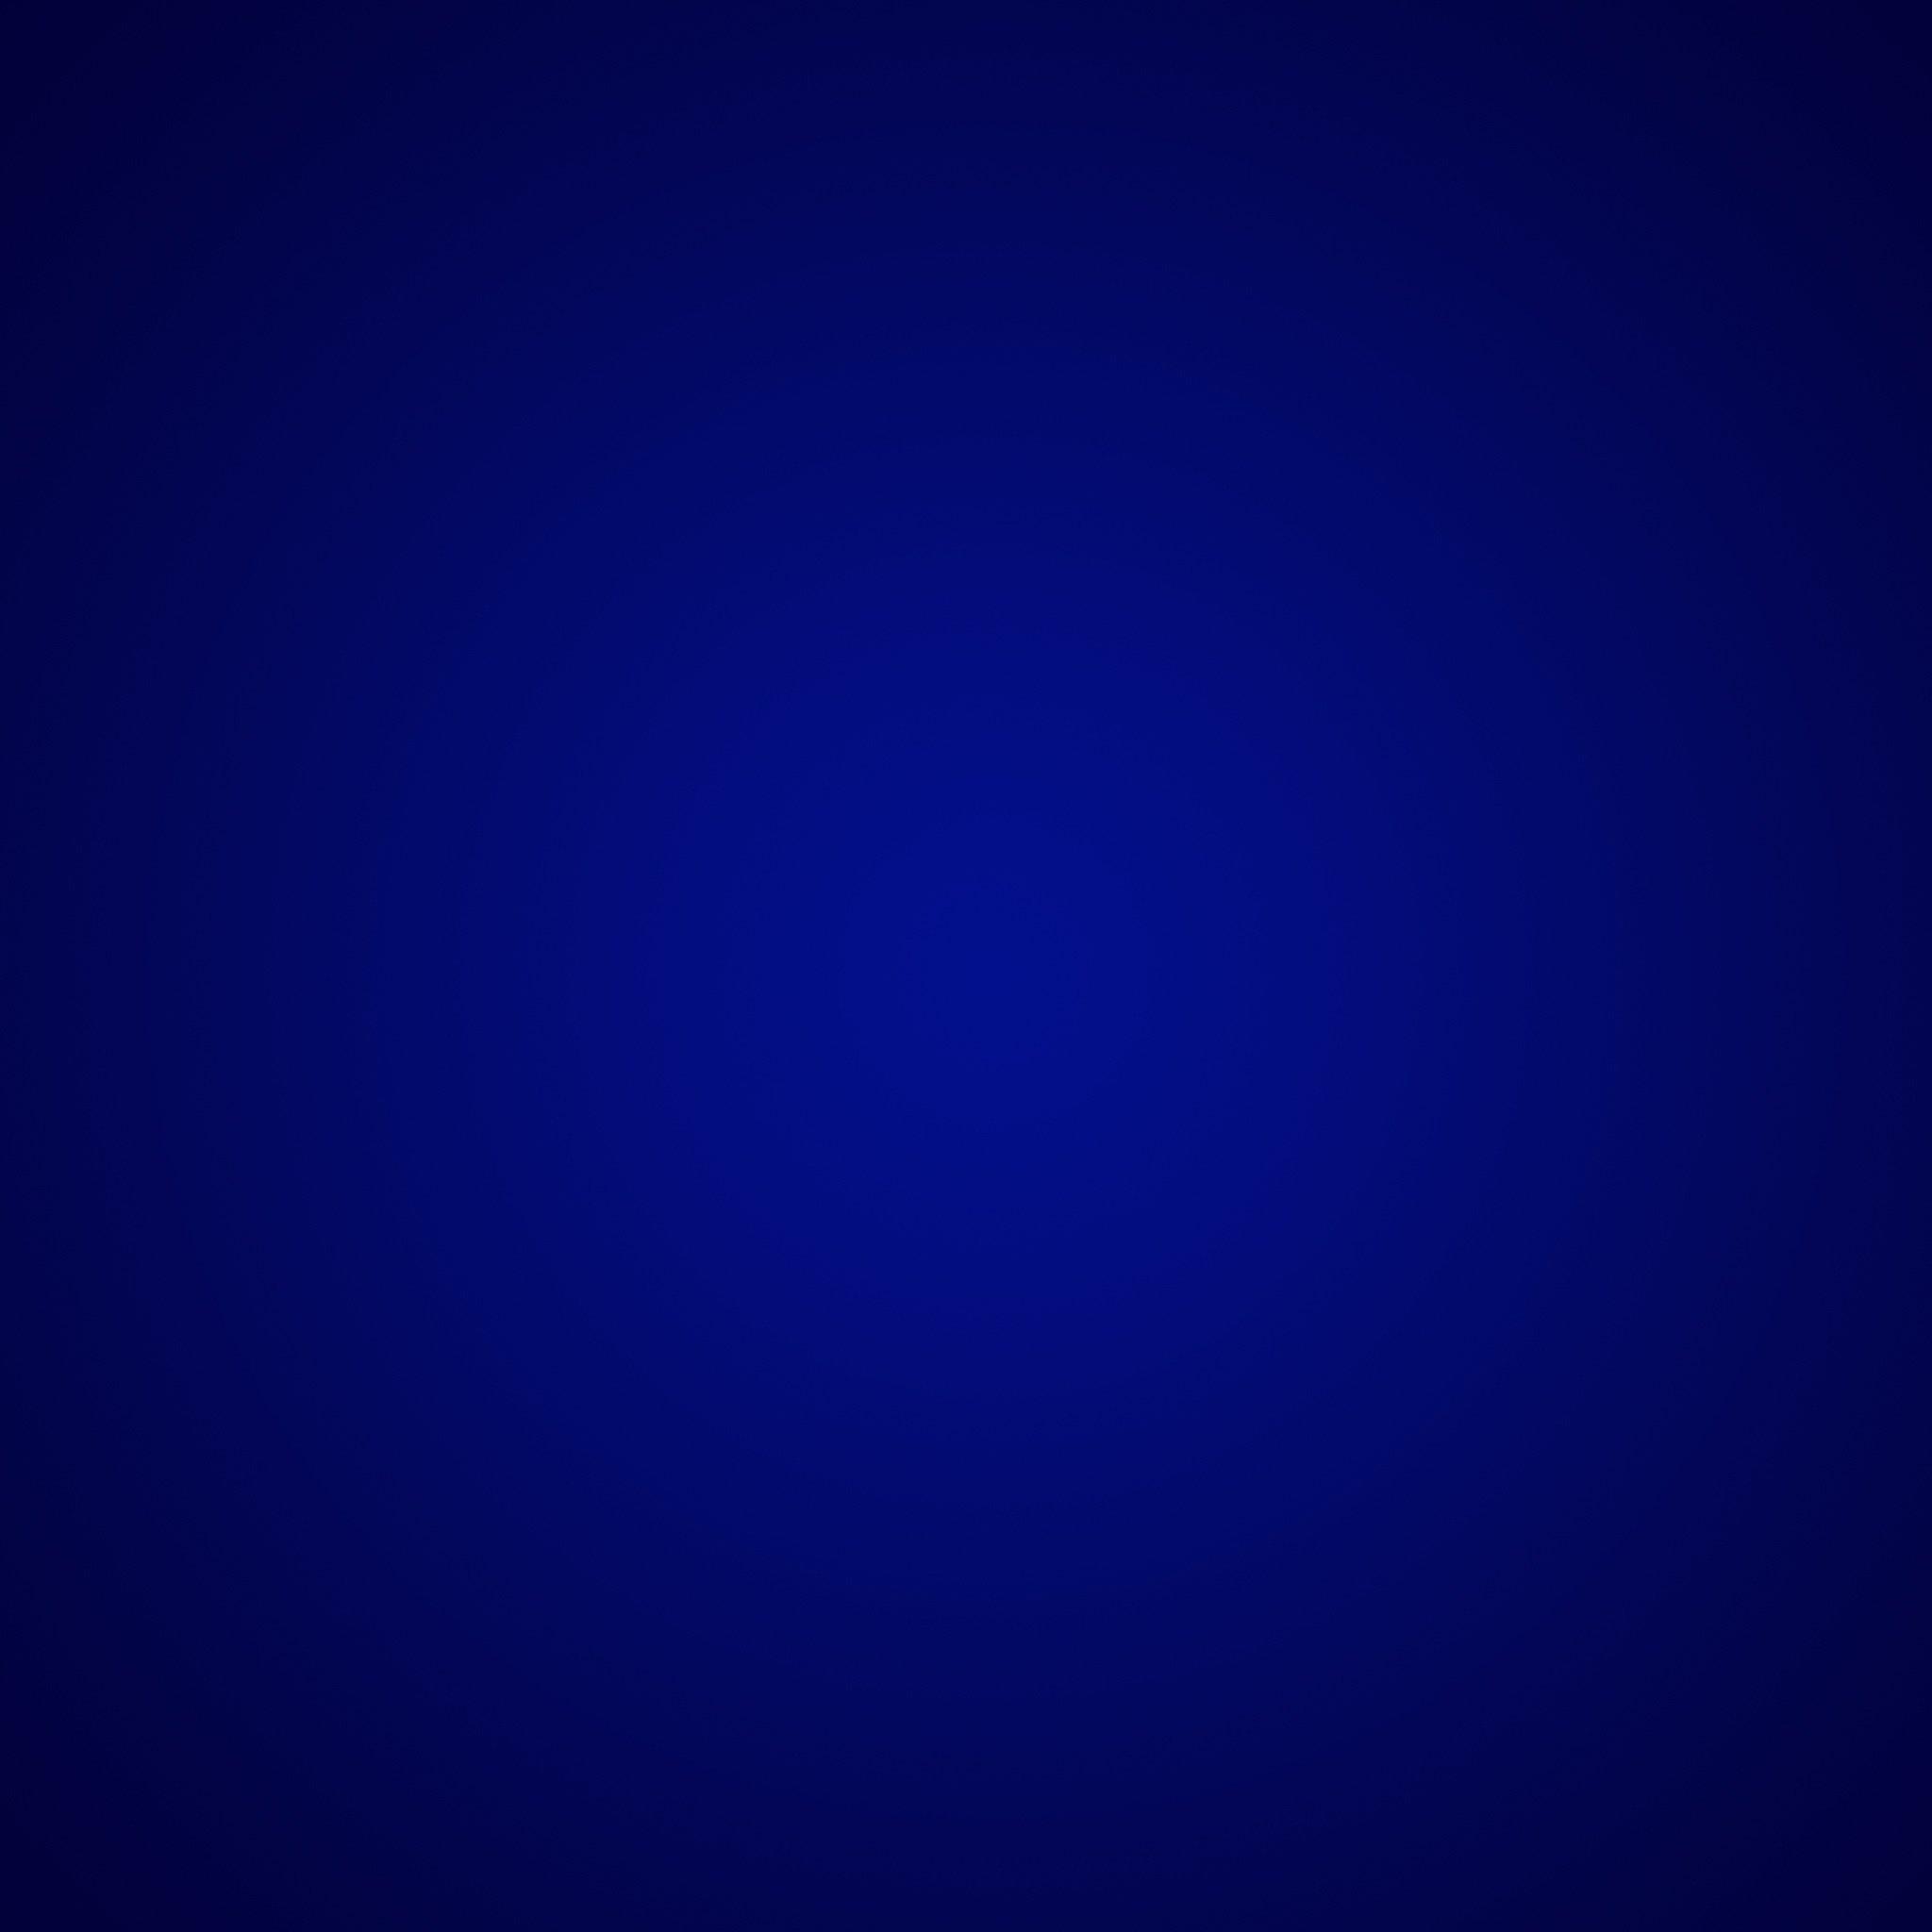 Dark Blue Wallpapers HD